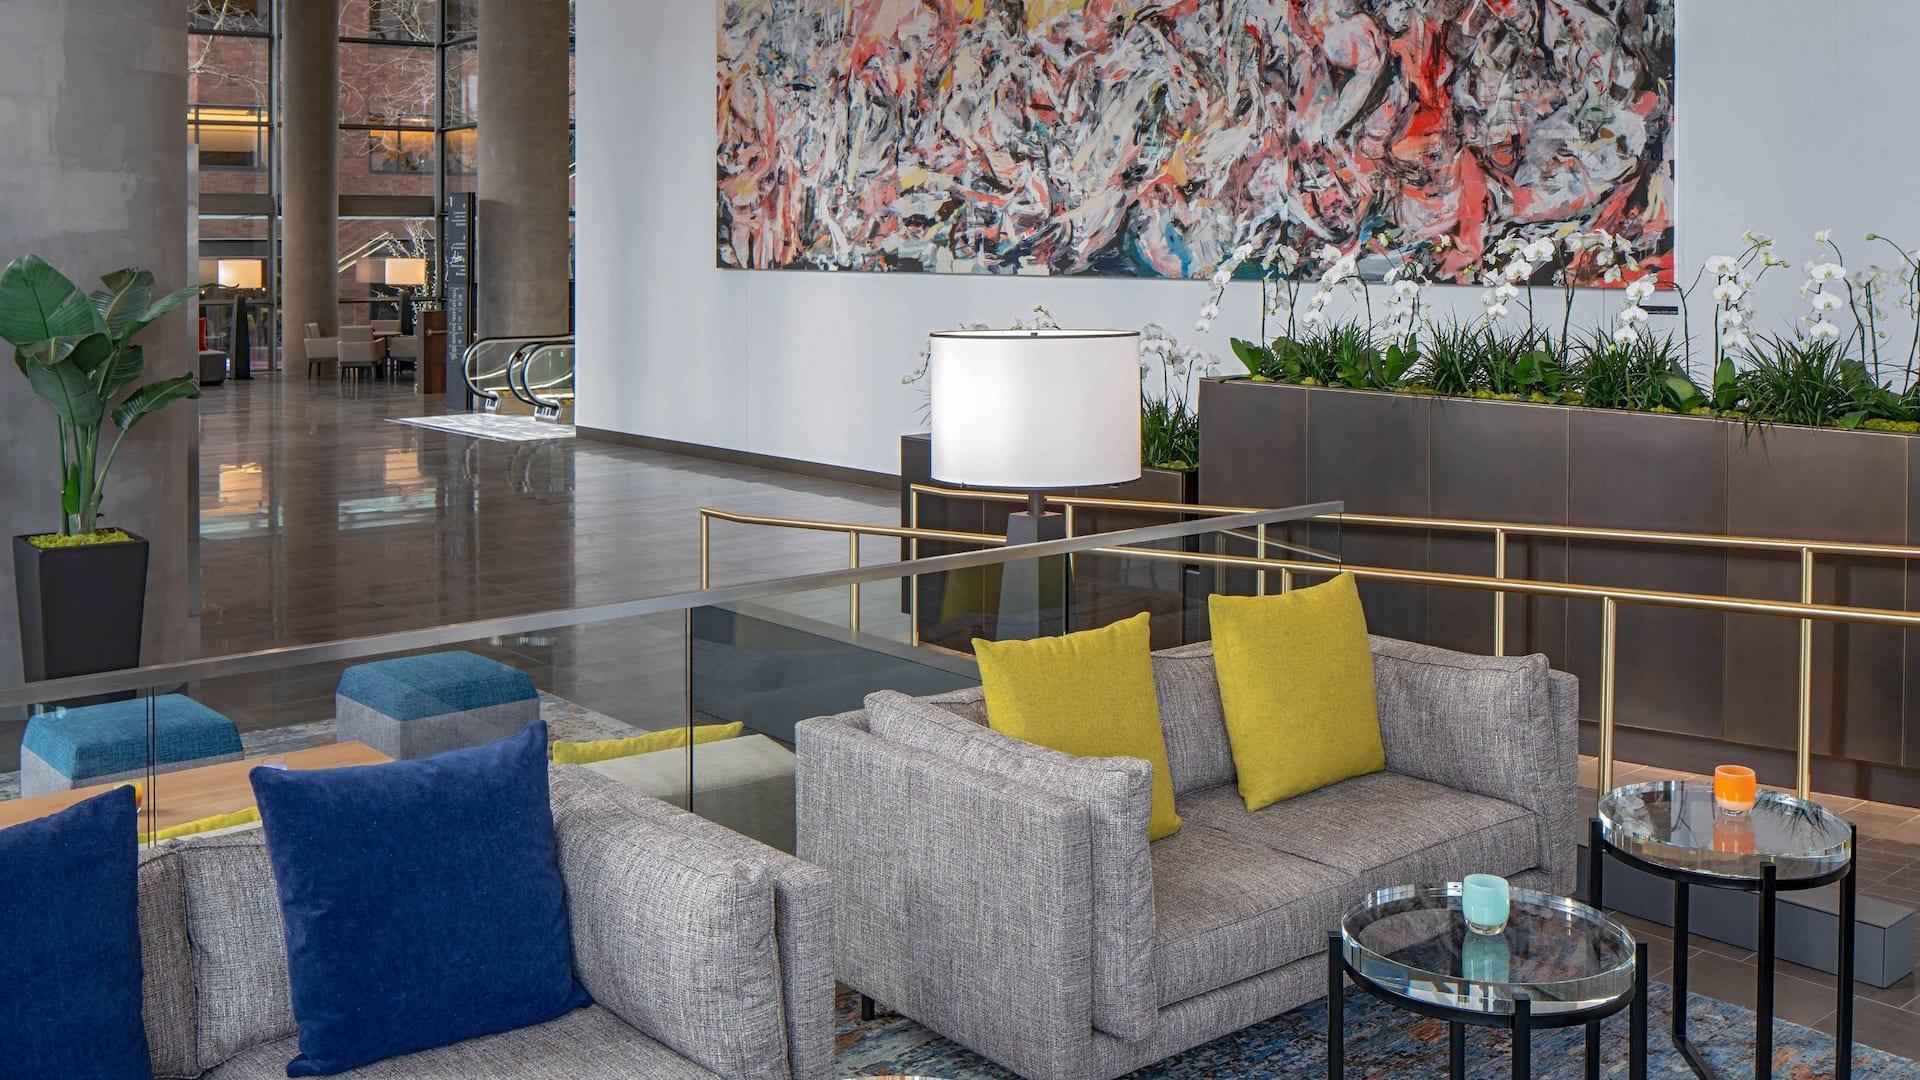 Downtown Hotel By Washington State Convention Center Hyatt Regency